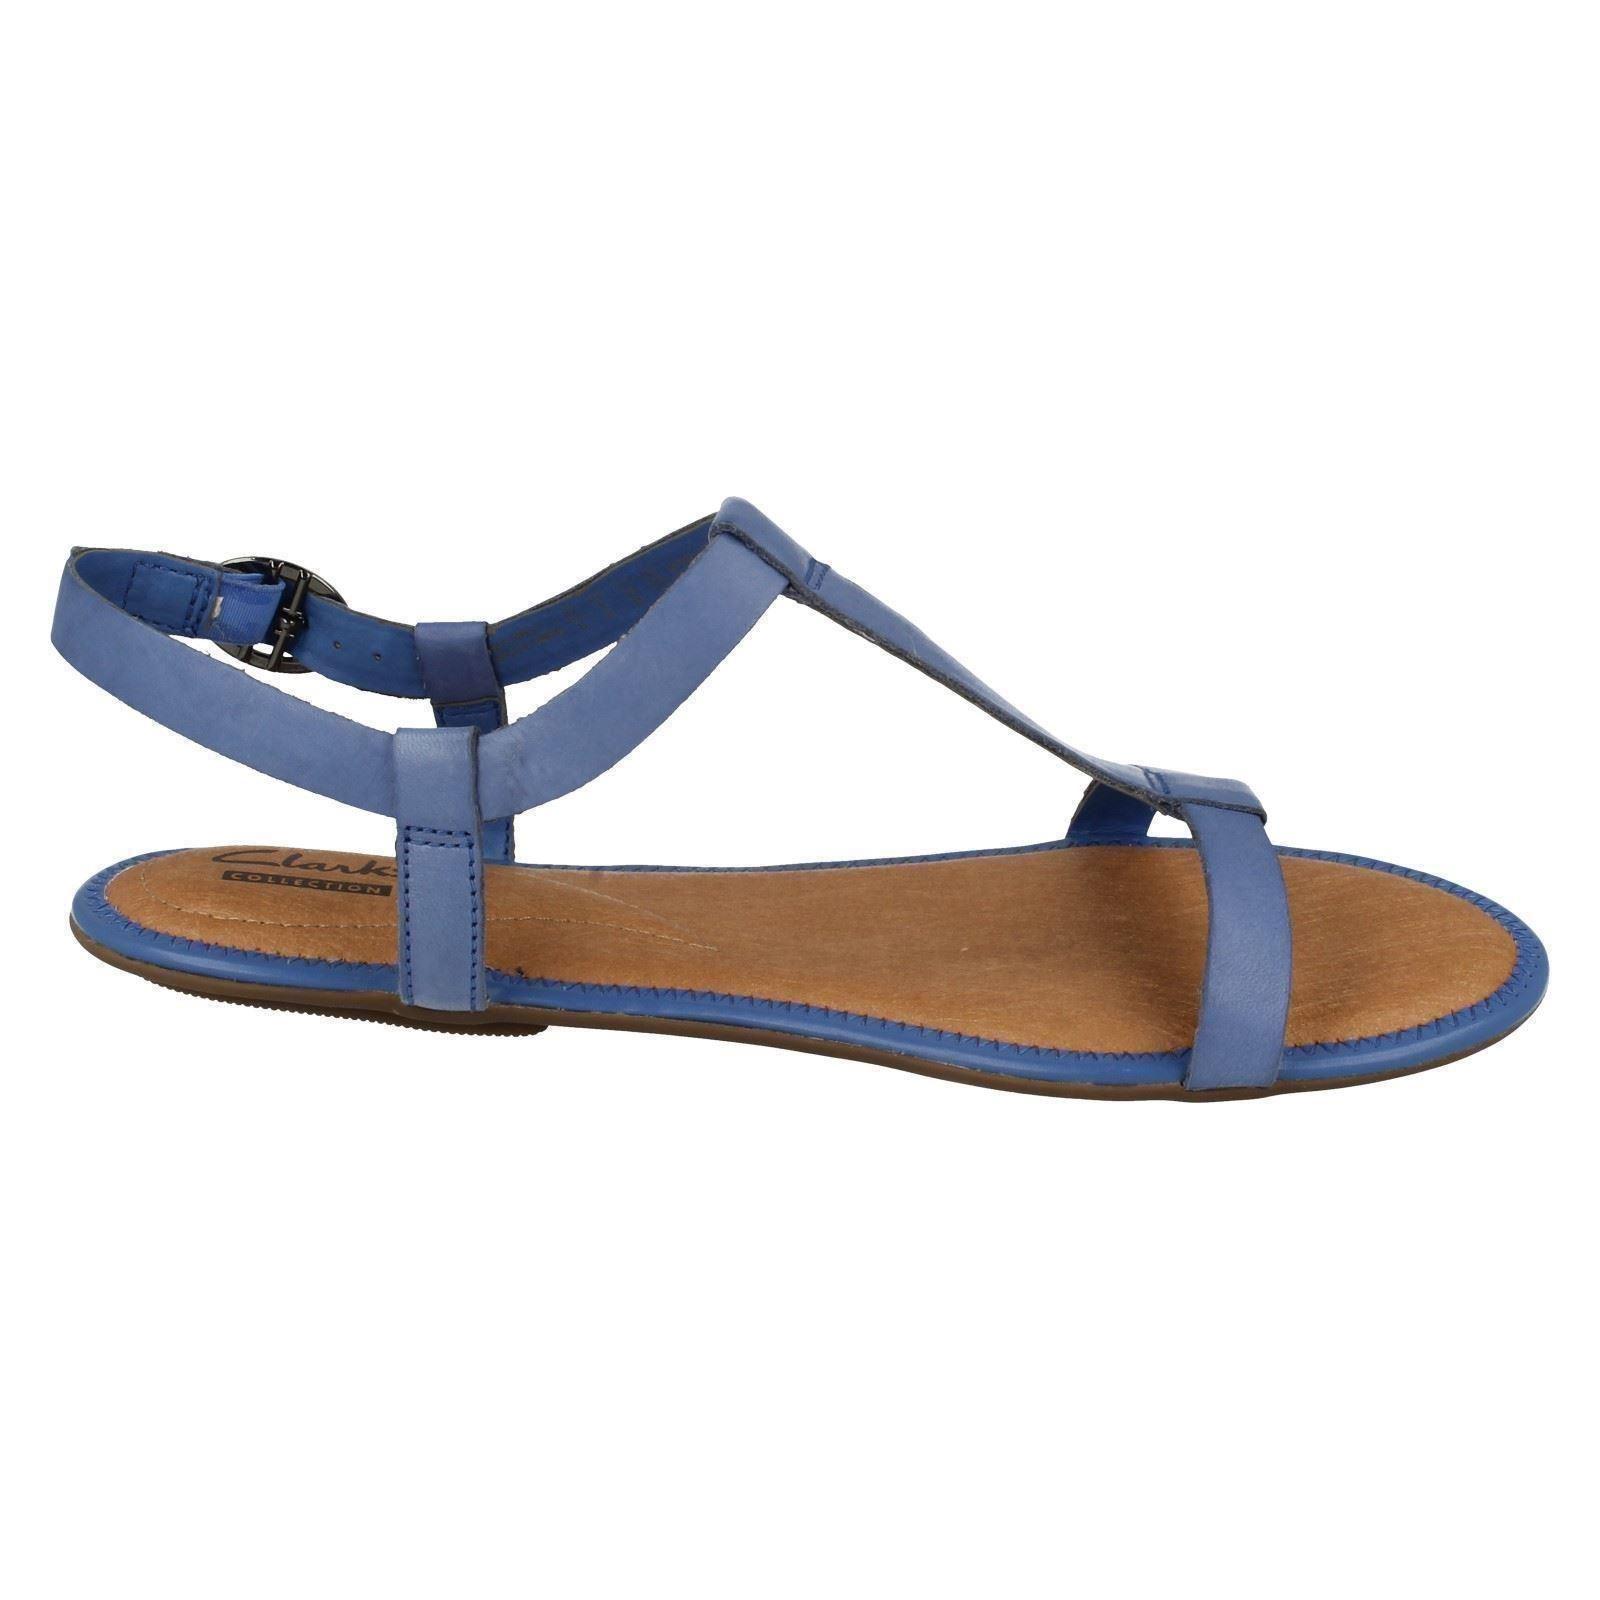 b58b20db999f3a Ladies-Clarks-Risi-Hop-Strap-Sandals thumbnail 10